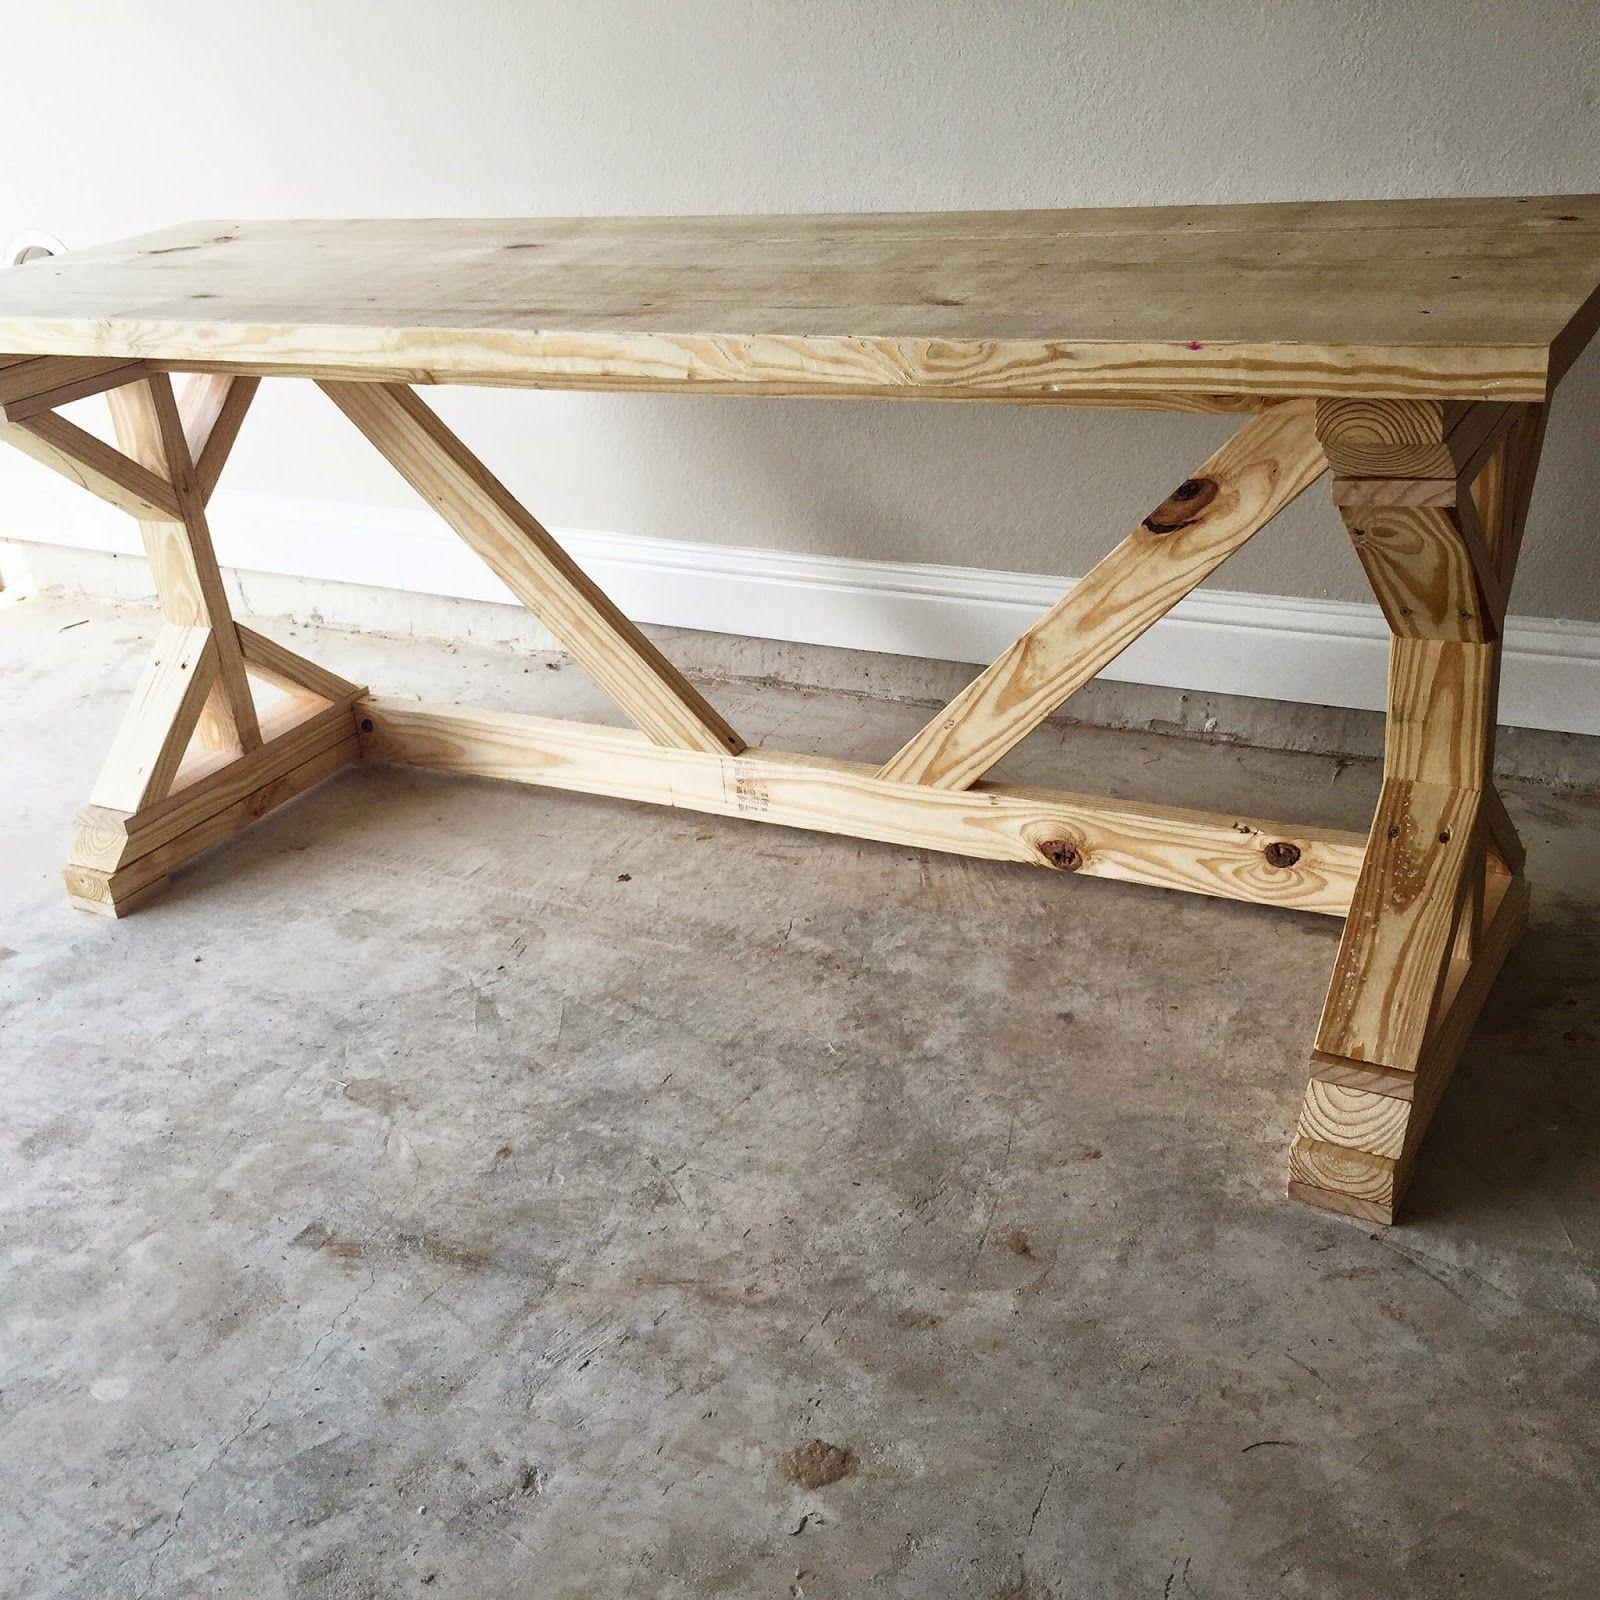 farmhouse bench plans shanty 2 chic